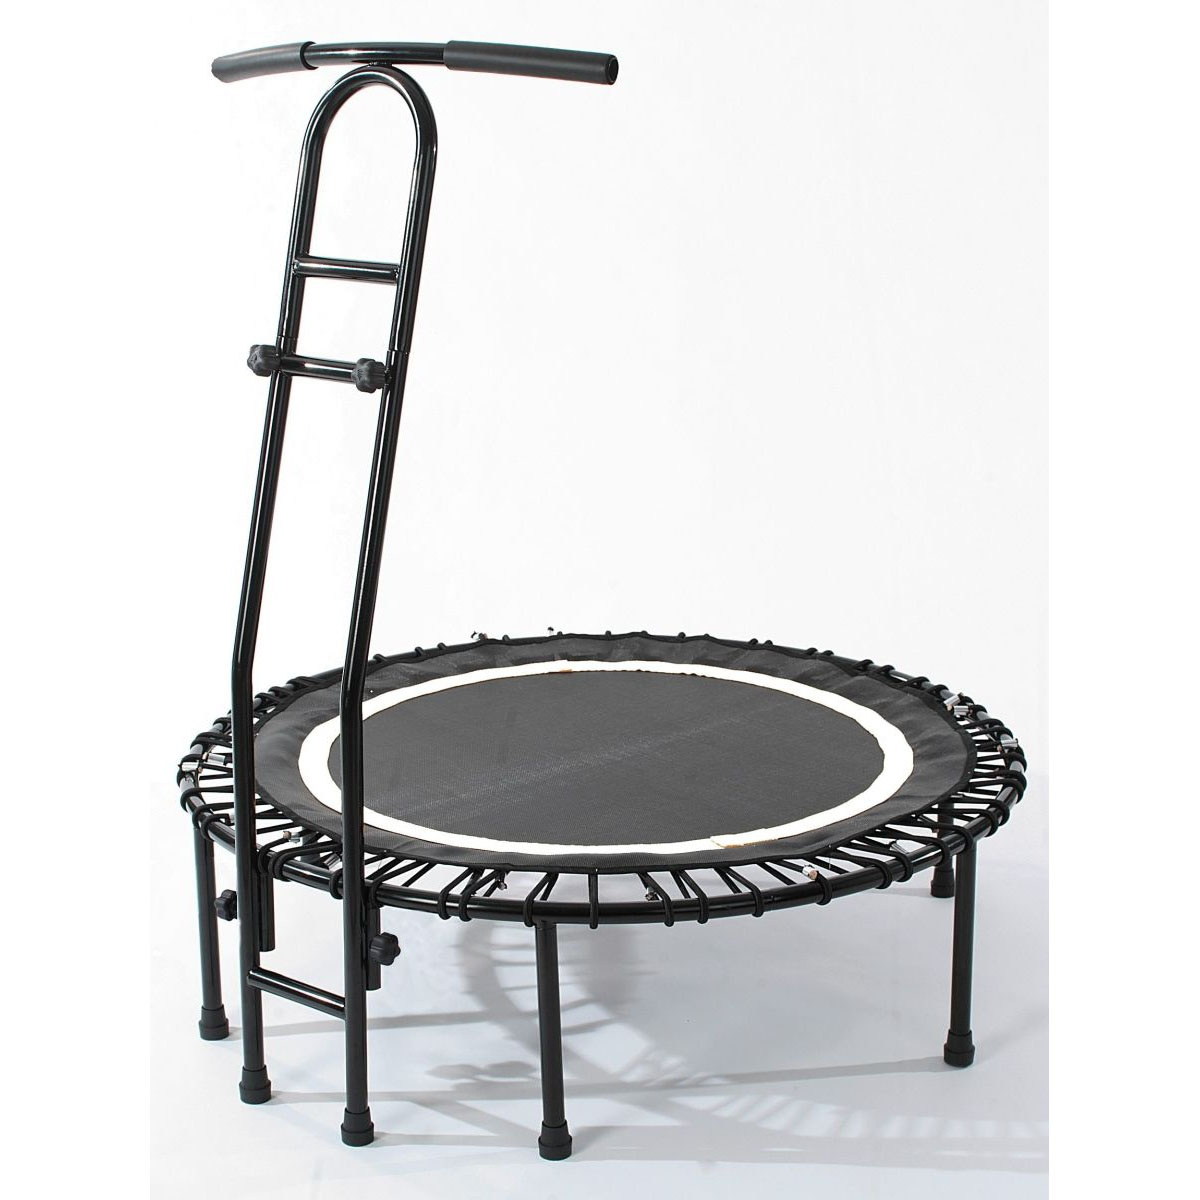 joka fit trampolin cacau indoor fitnesstrampolin mit griffstange schwarz wei ebay. Black Bedroom Furniture Sets. Home Design Ideas